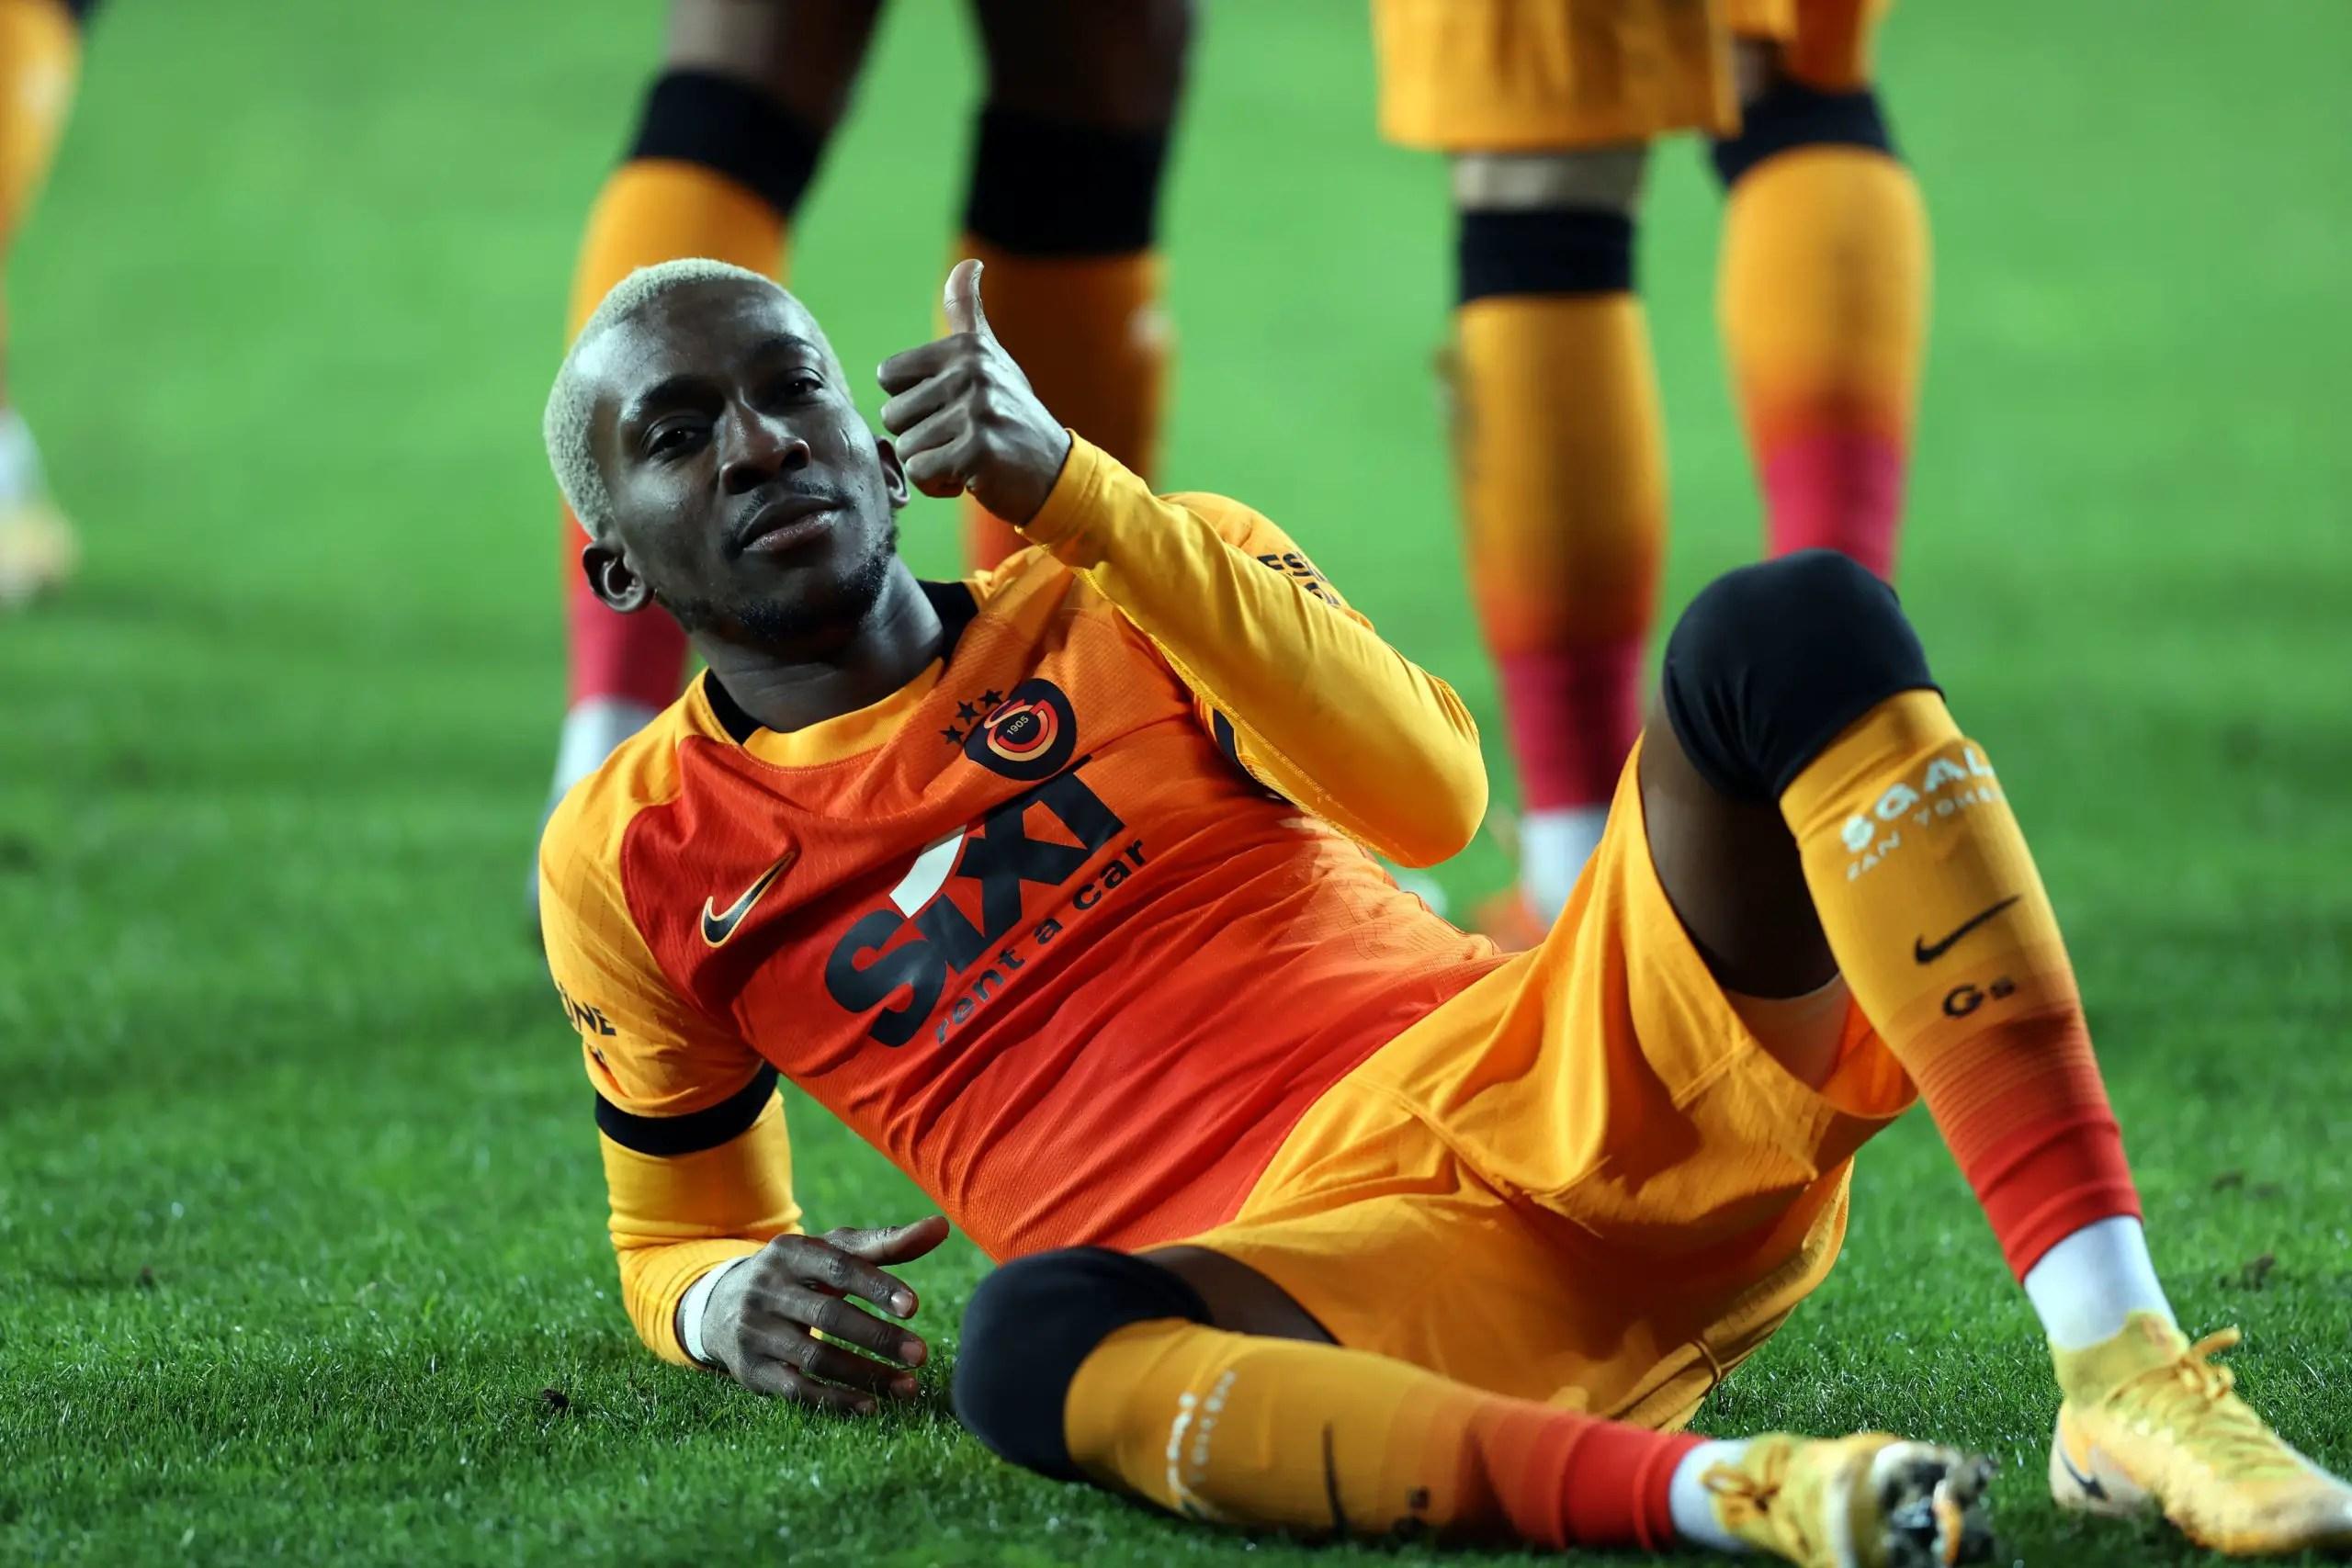 Galatasaray To Pay €4.3m For Onyekuru